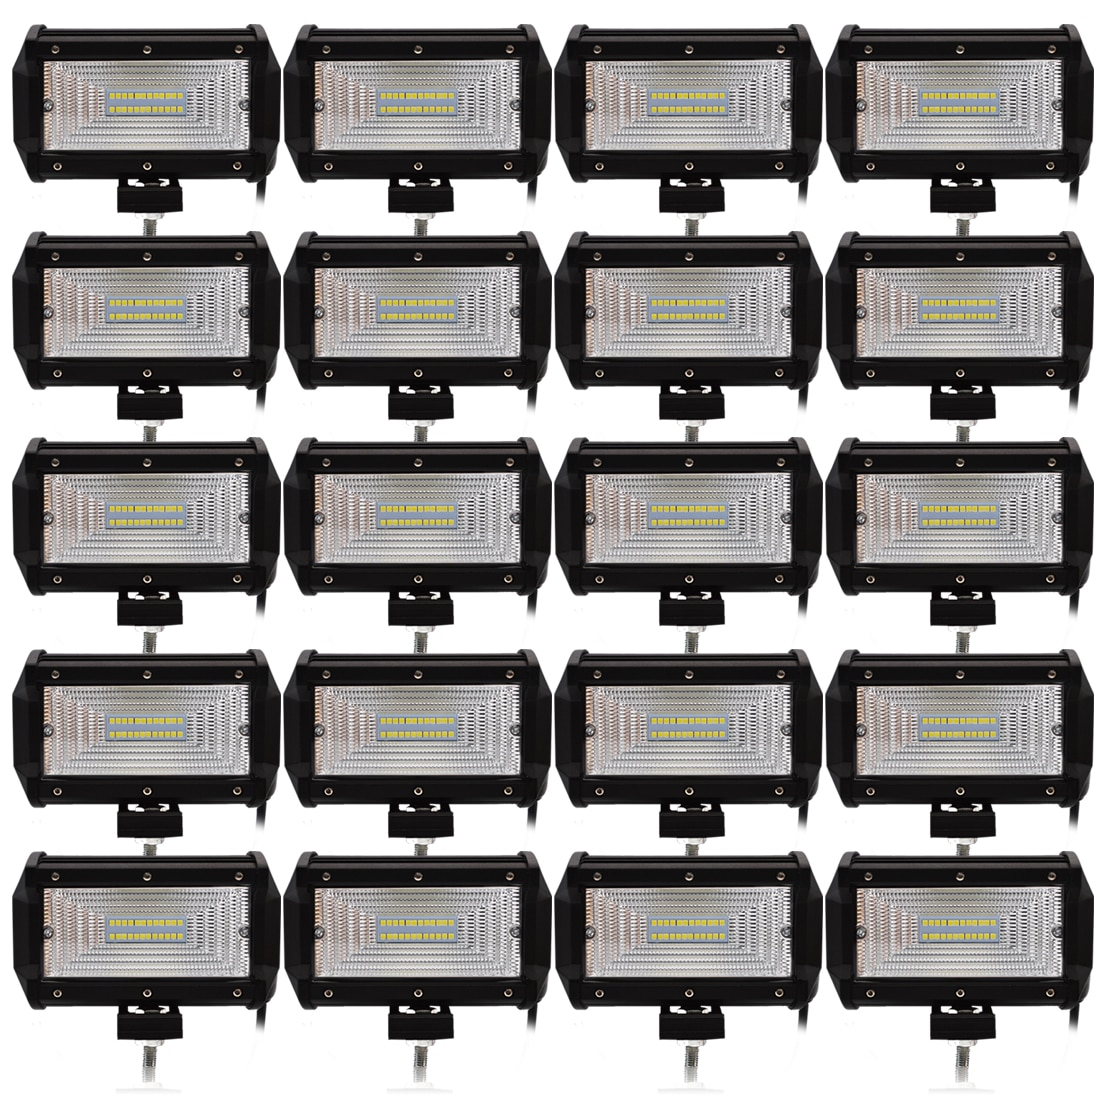 Safego 20pcs 5 Inch 72W LED Flood Work Light 24*3W LED Chips Offroad Car Light Fog Light Driving Light For Trunk Boat Tractor